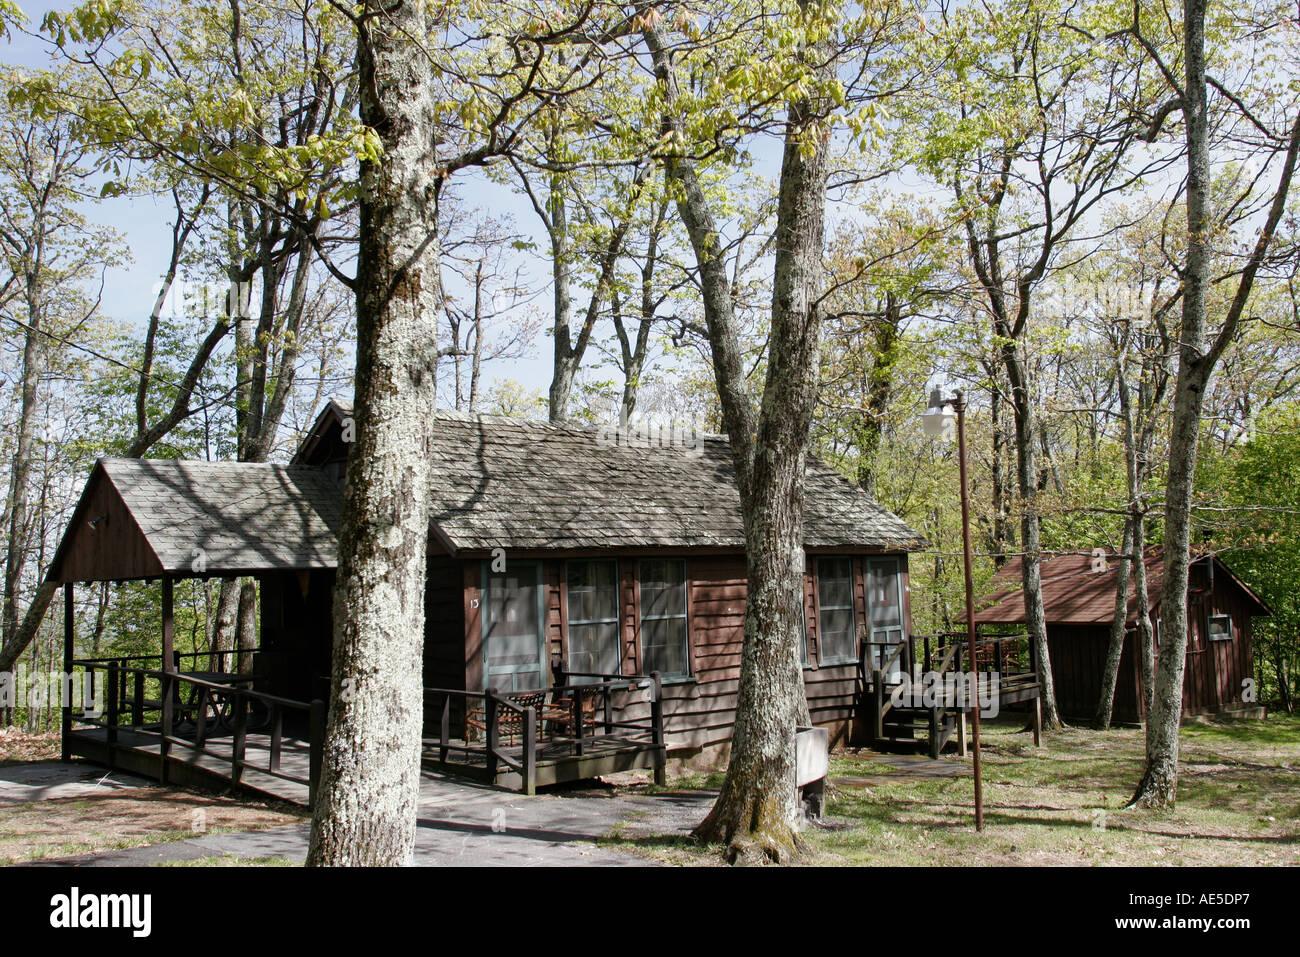 Shenandoah National Park Virginialewis Mountain Cabins